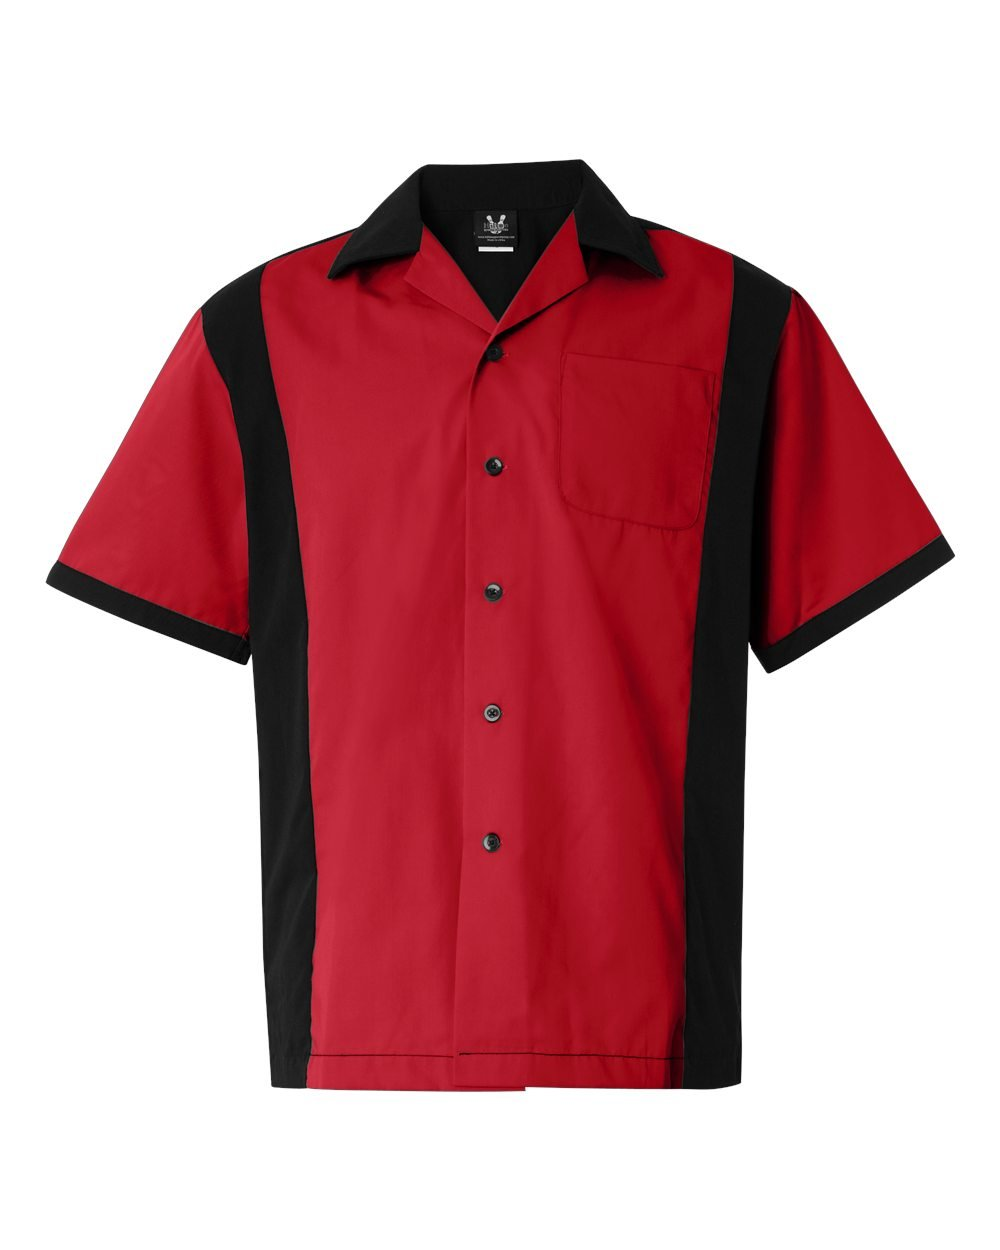 Hilton Bowling Retro Cruiser, Red/Black, Large by Hilton